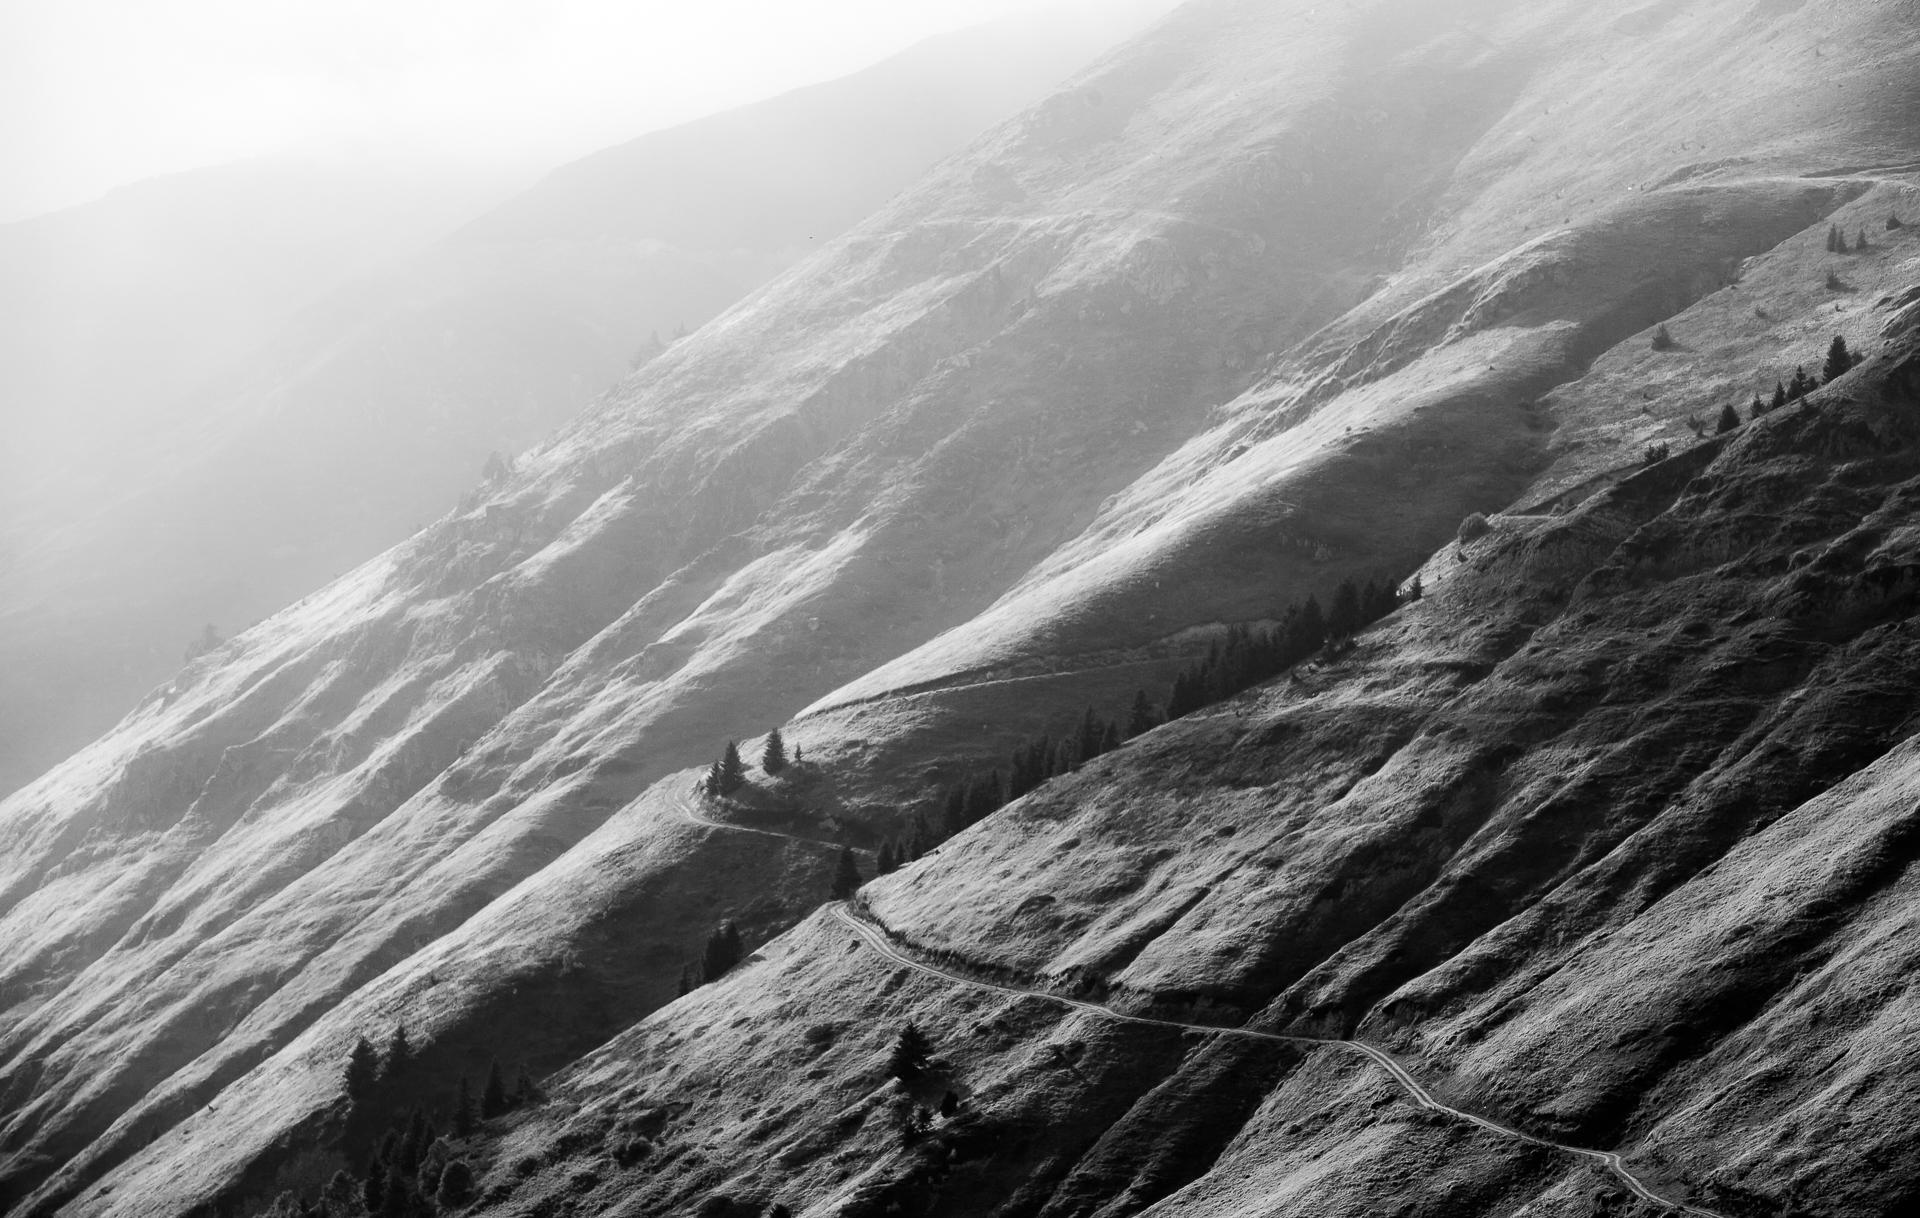 Montagnes de contraste